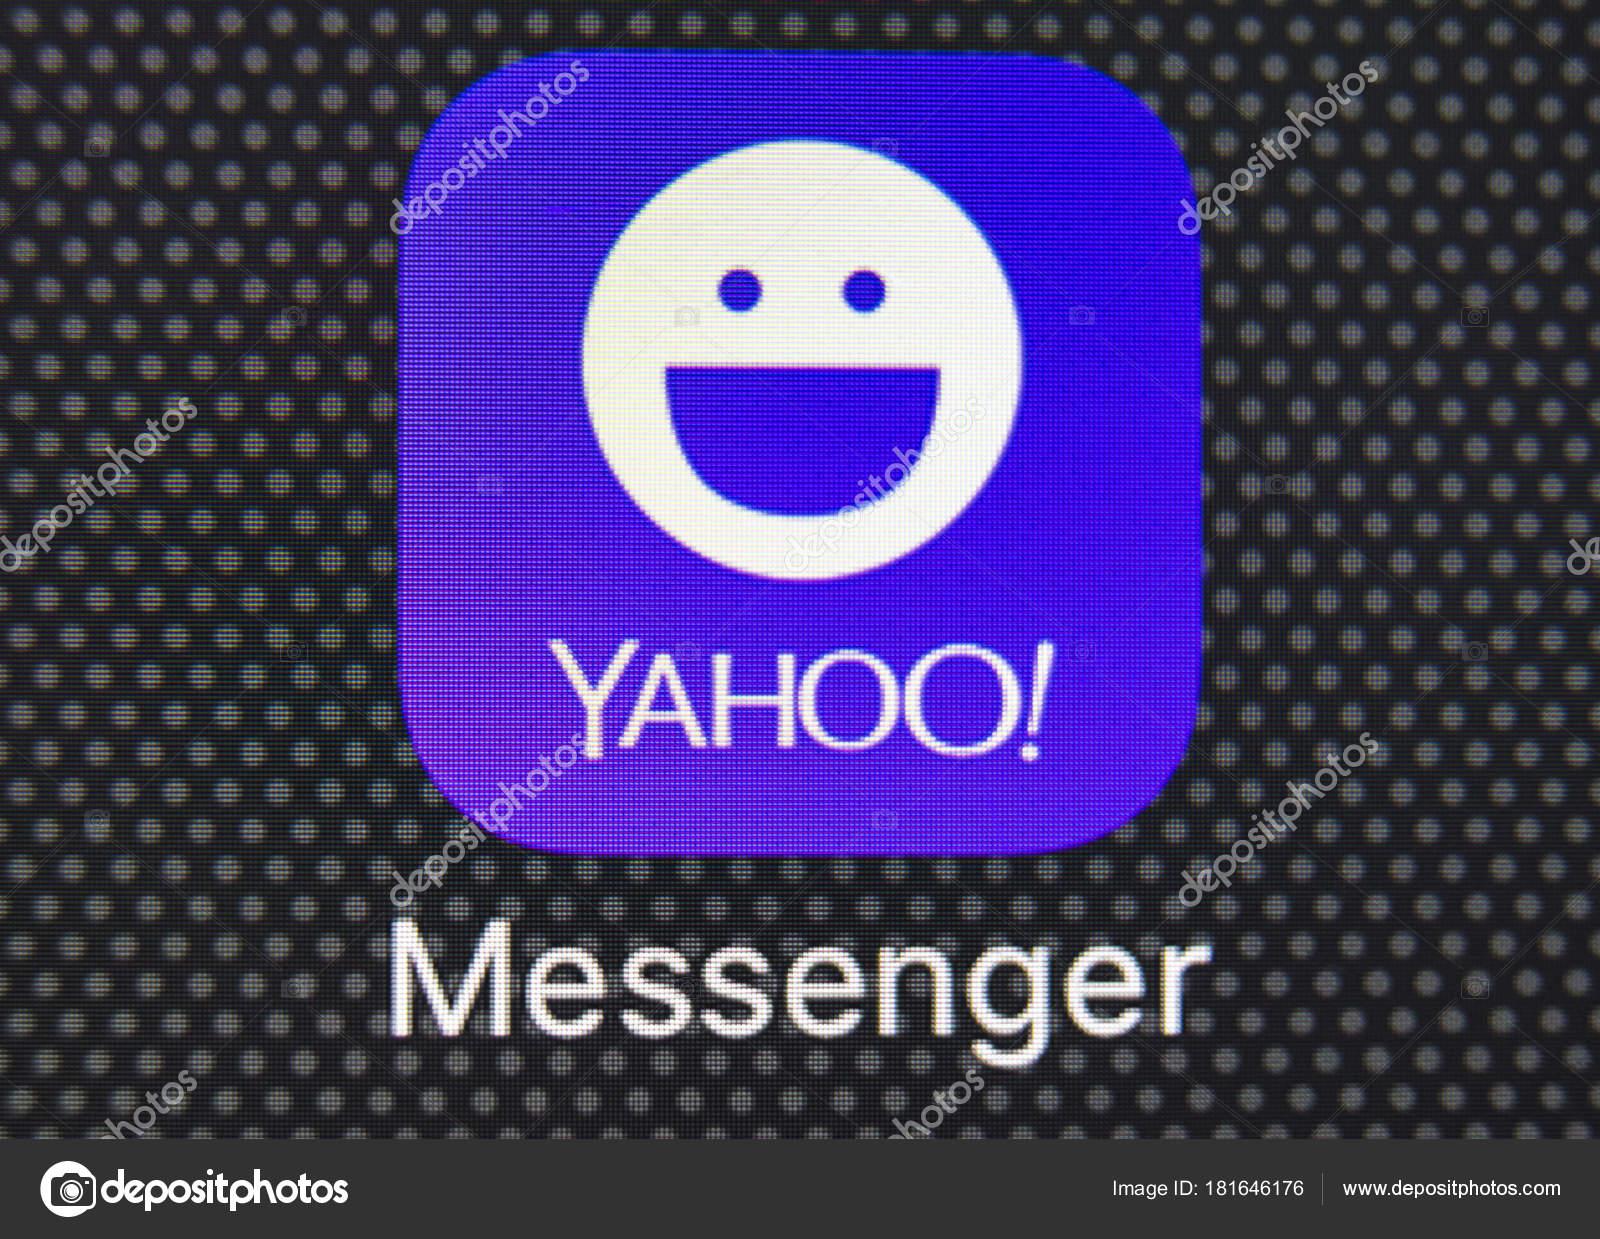 Yahoo messenger application icon on Apple iPhone 8